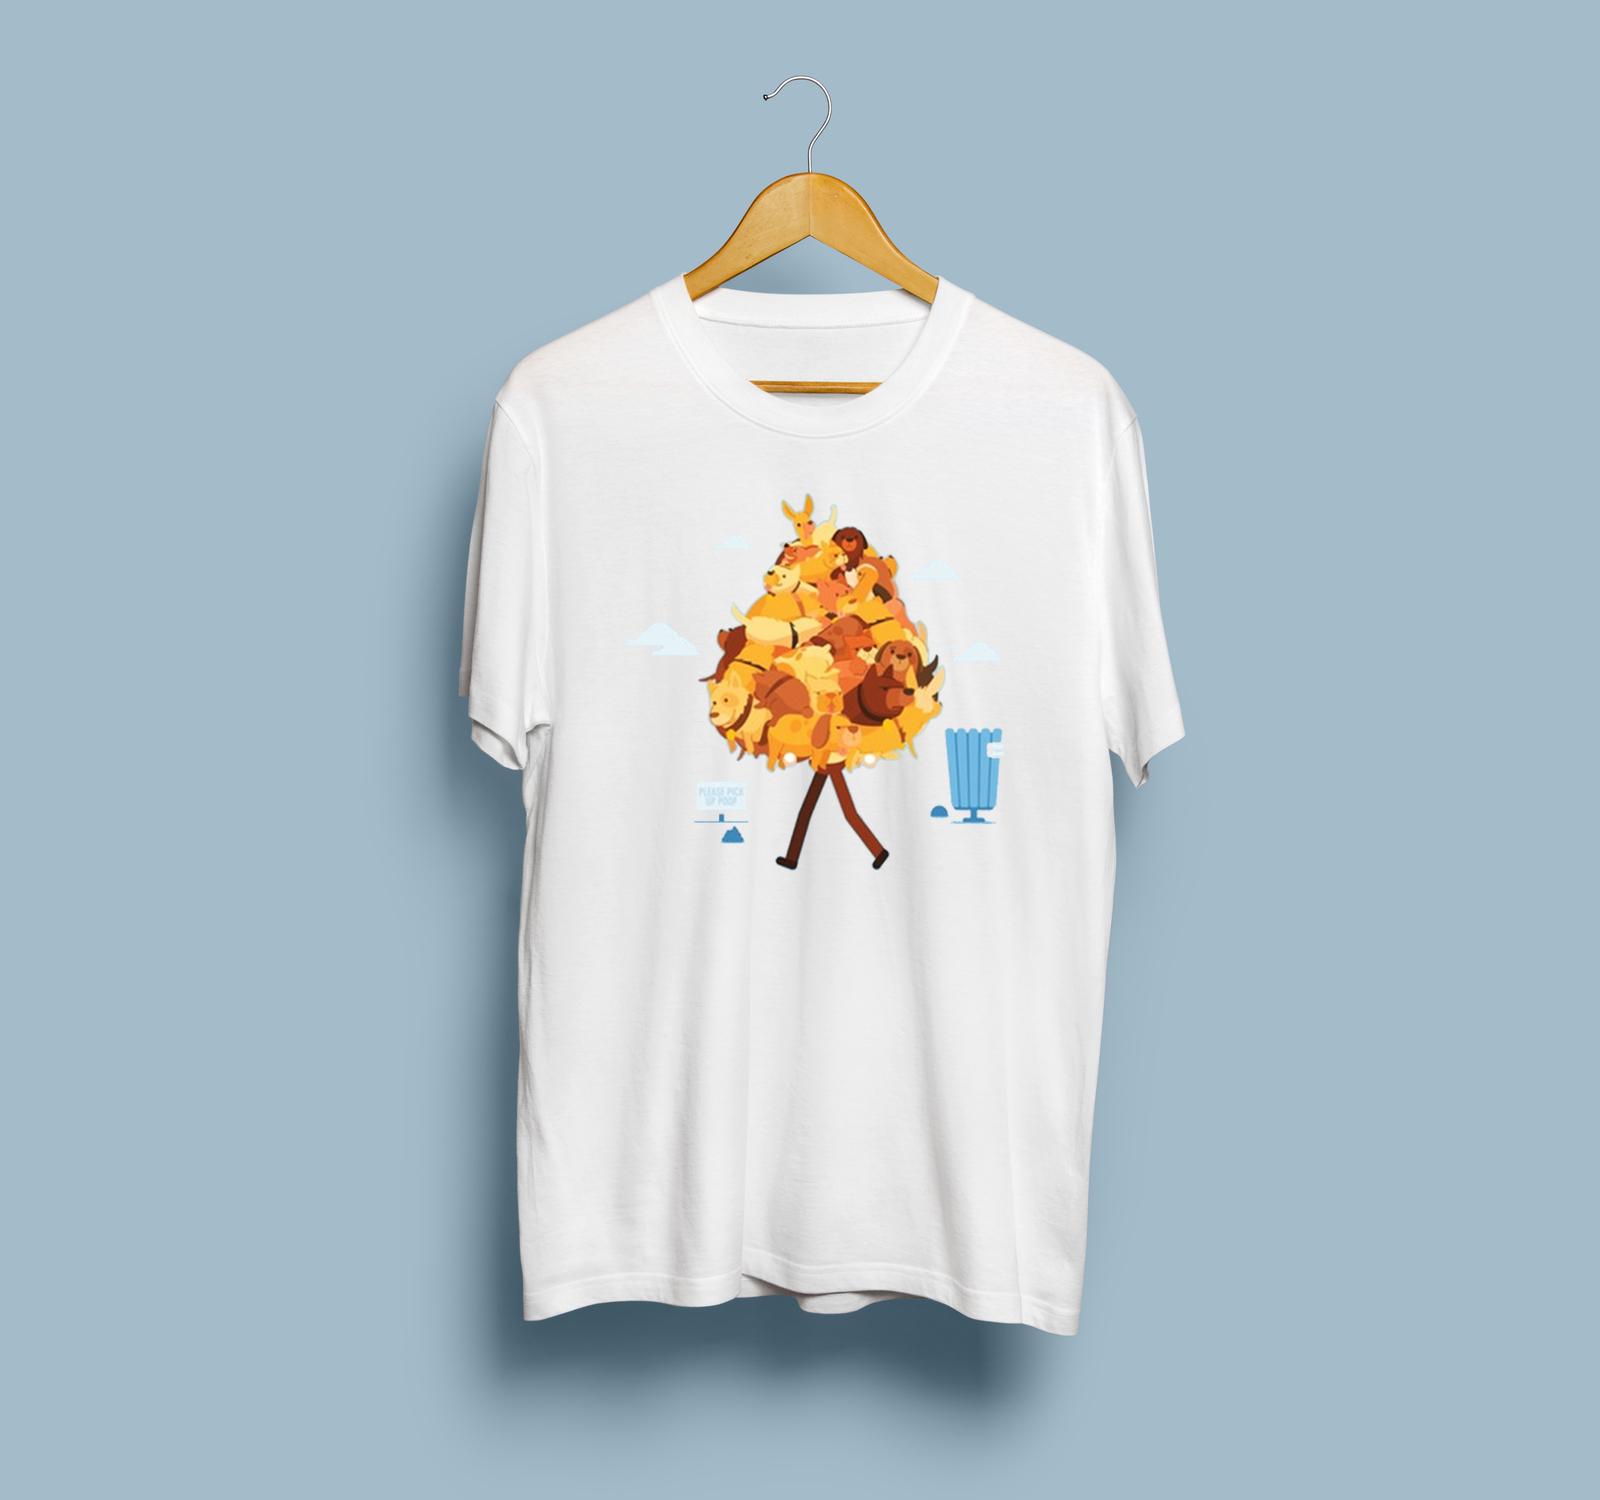 HOT SALE Dog Collector Gildan T-shirt Size S To 2XL